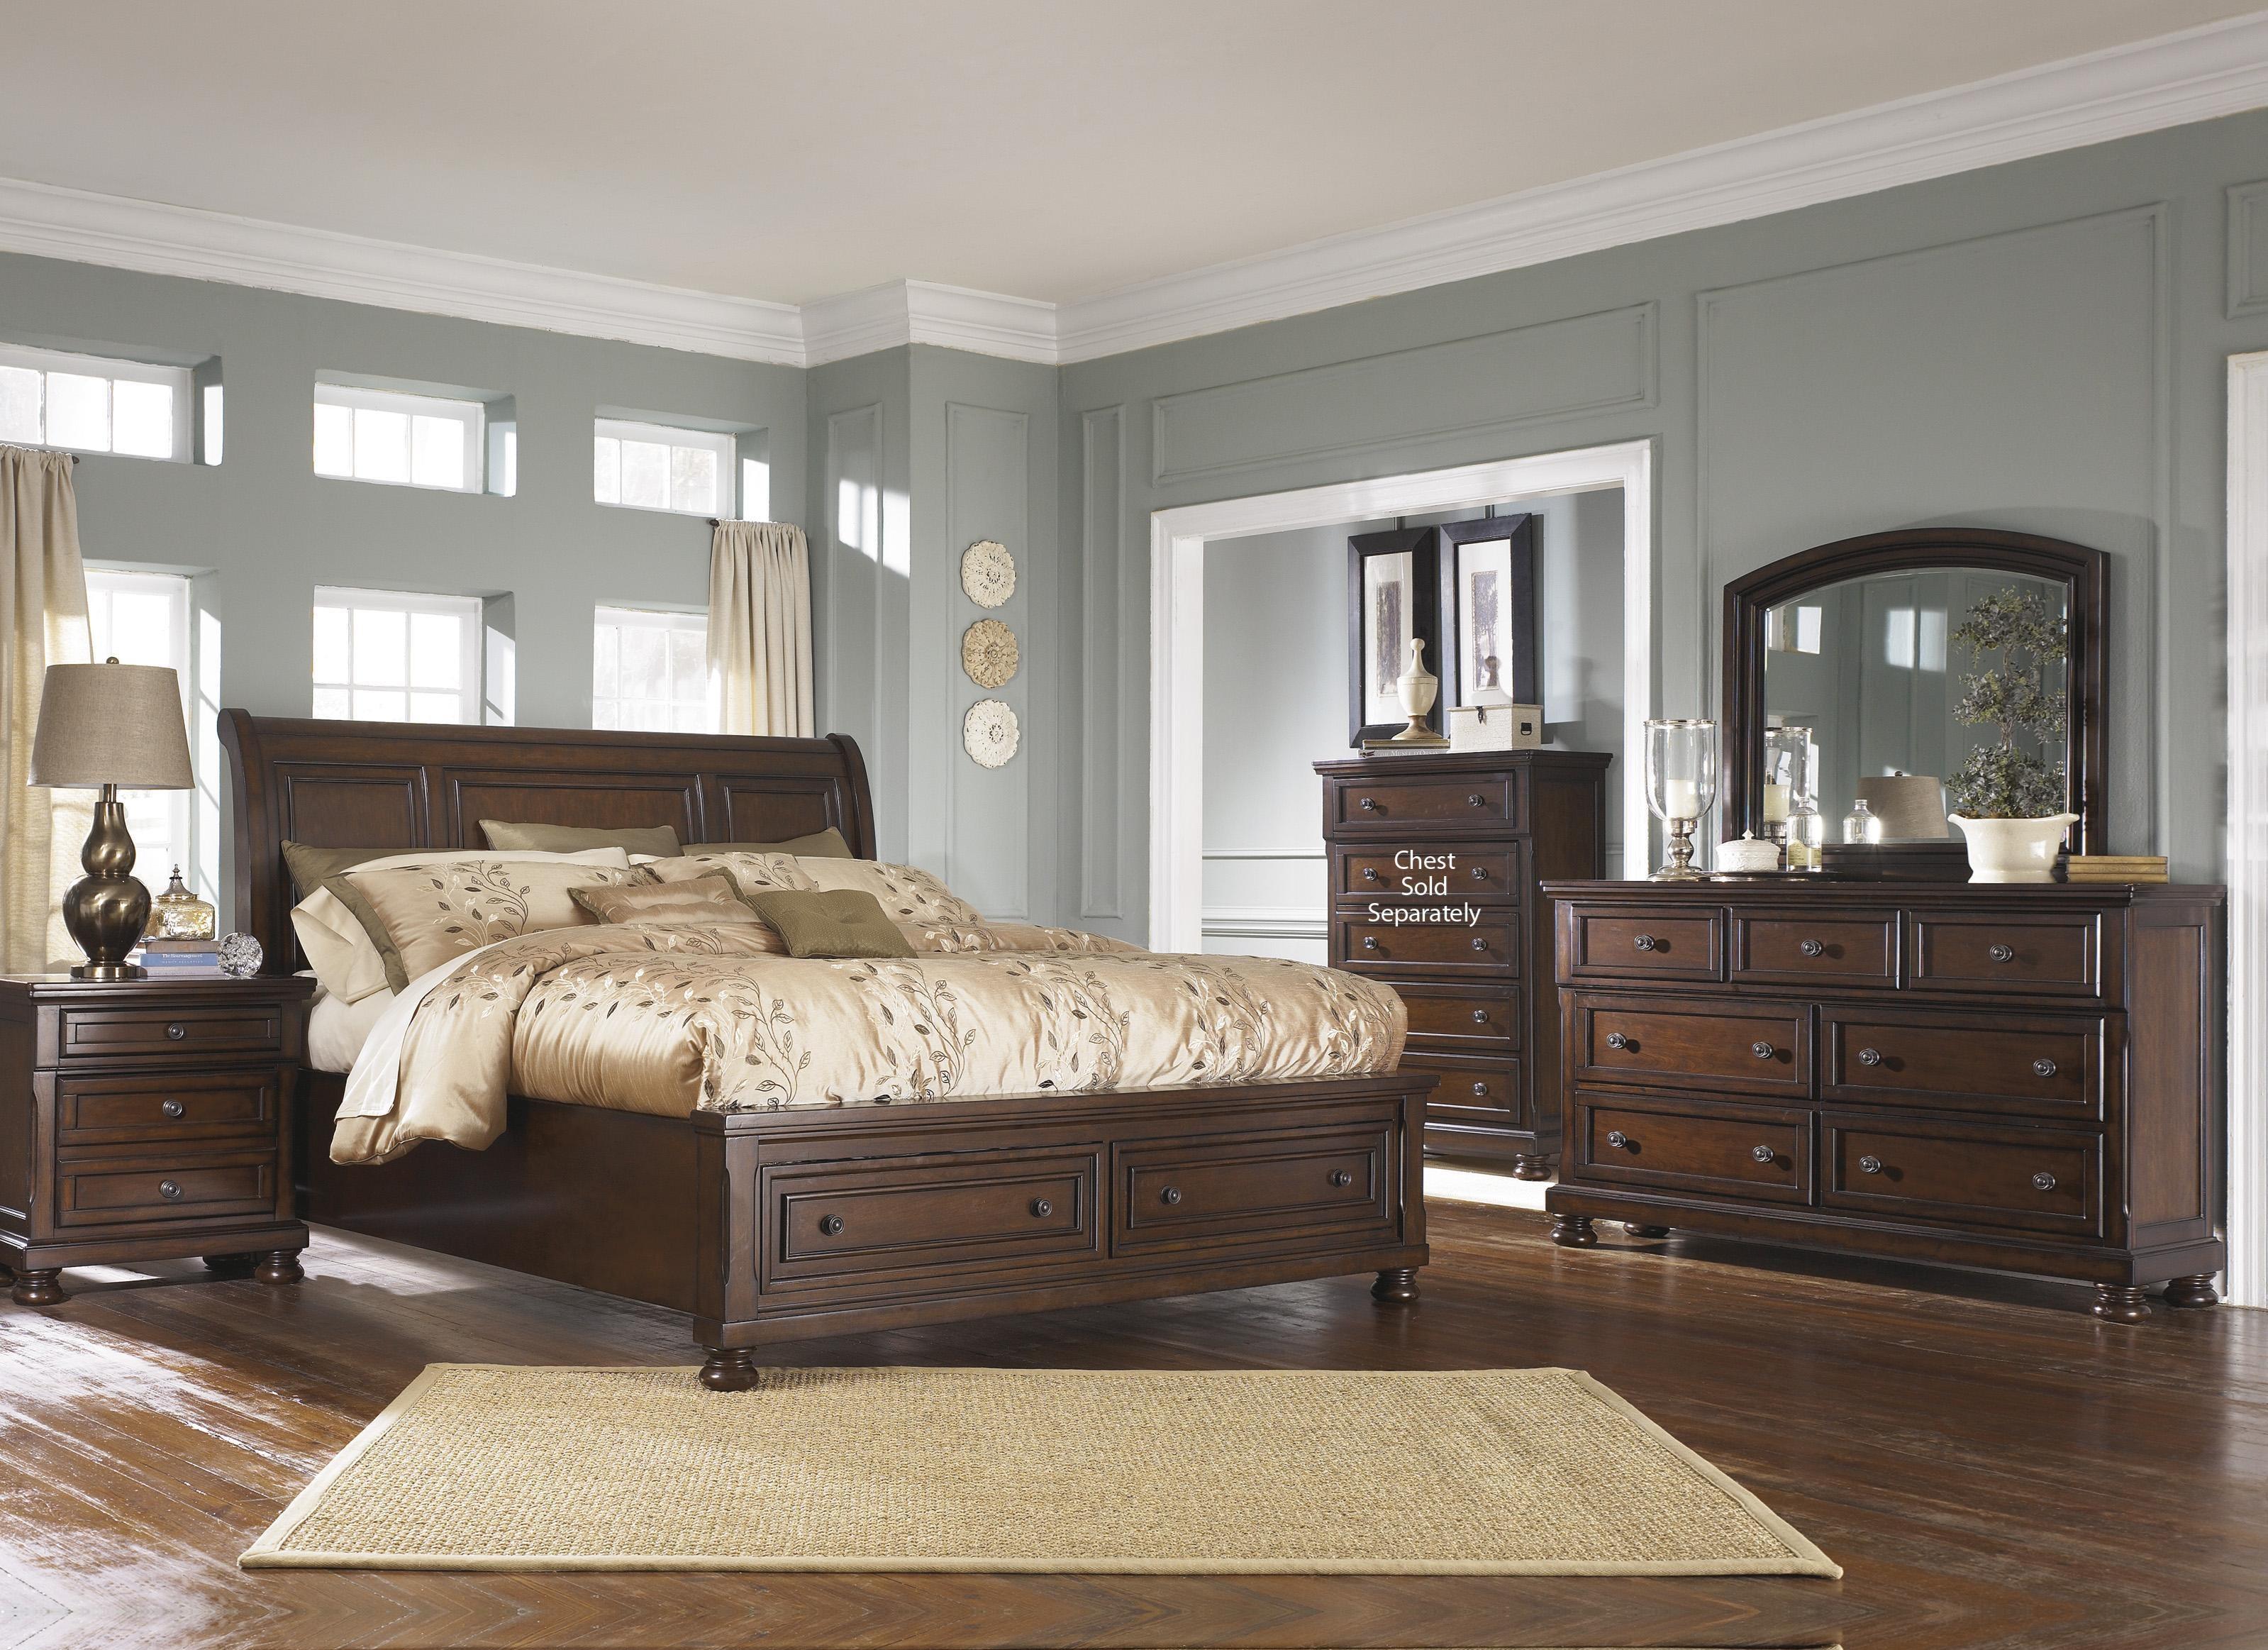 ashley furniture porter 14010500196900